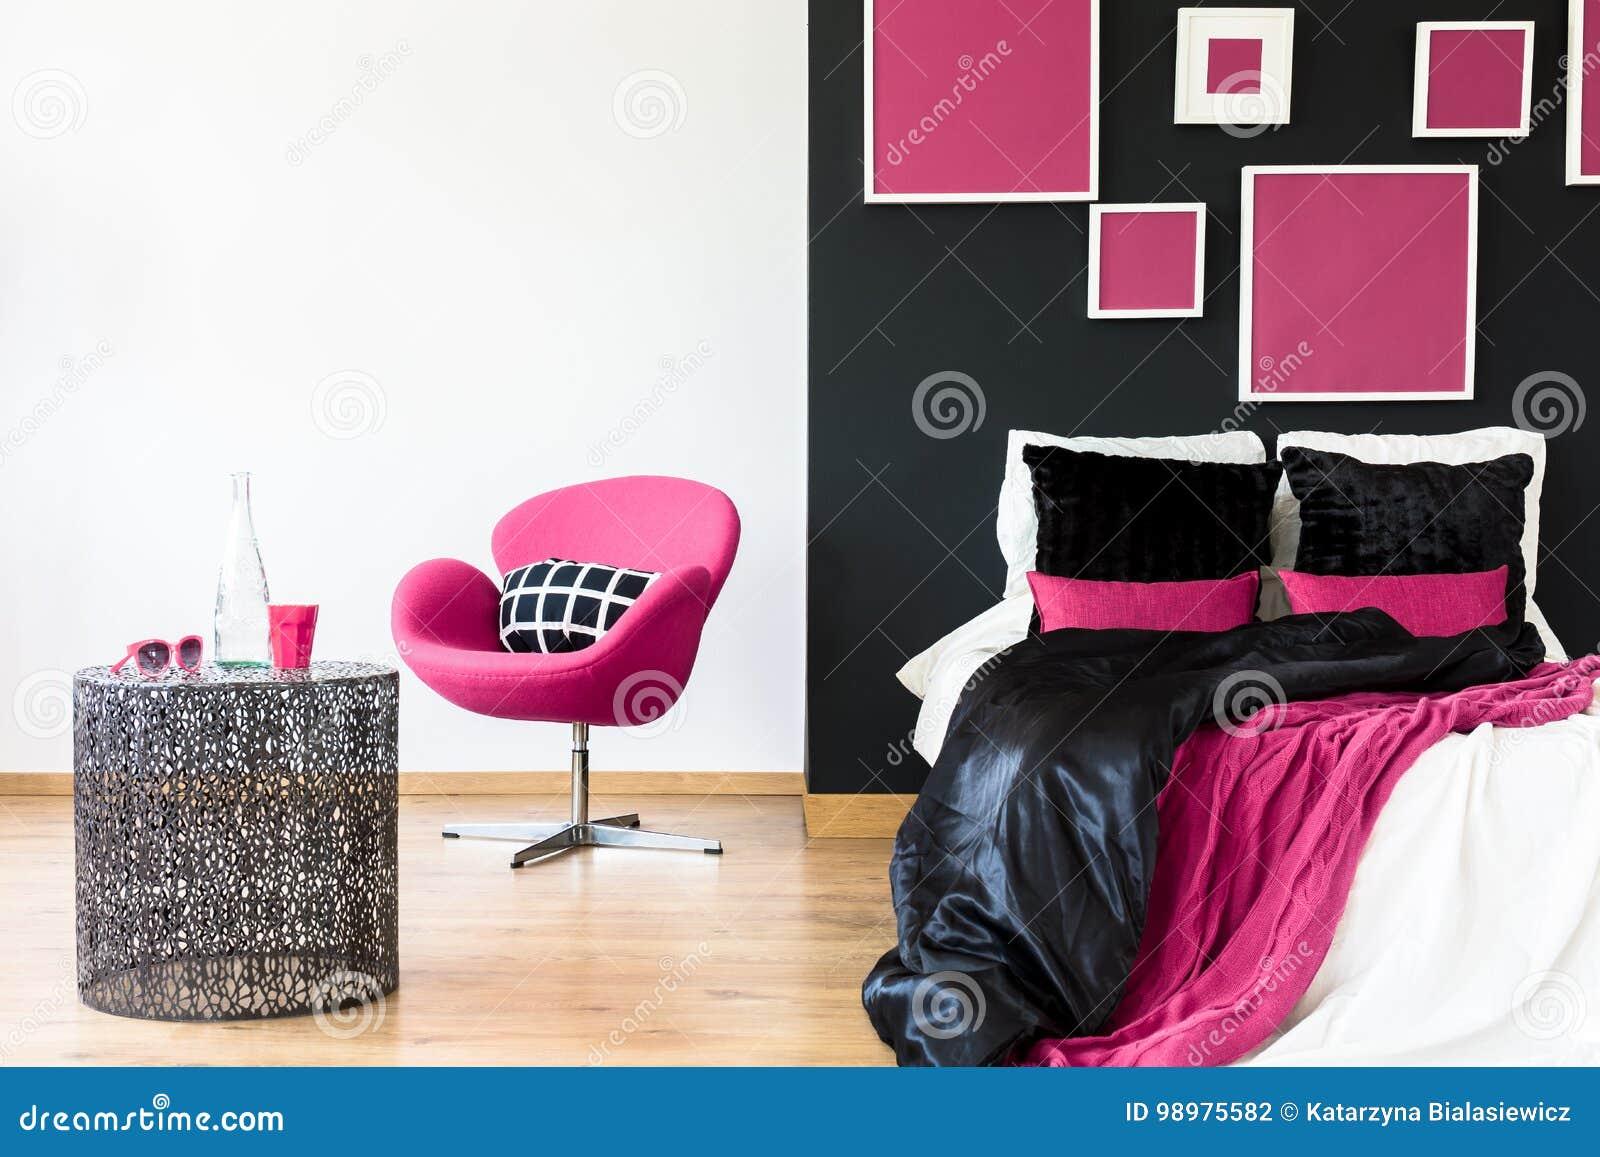 Chaise Rose Dans La Chambre A Coucher Girly Photo Stock Image Du